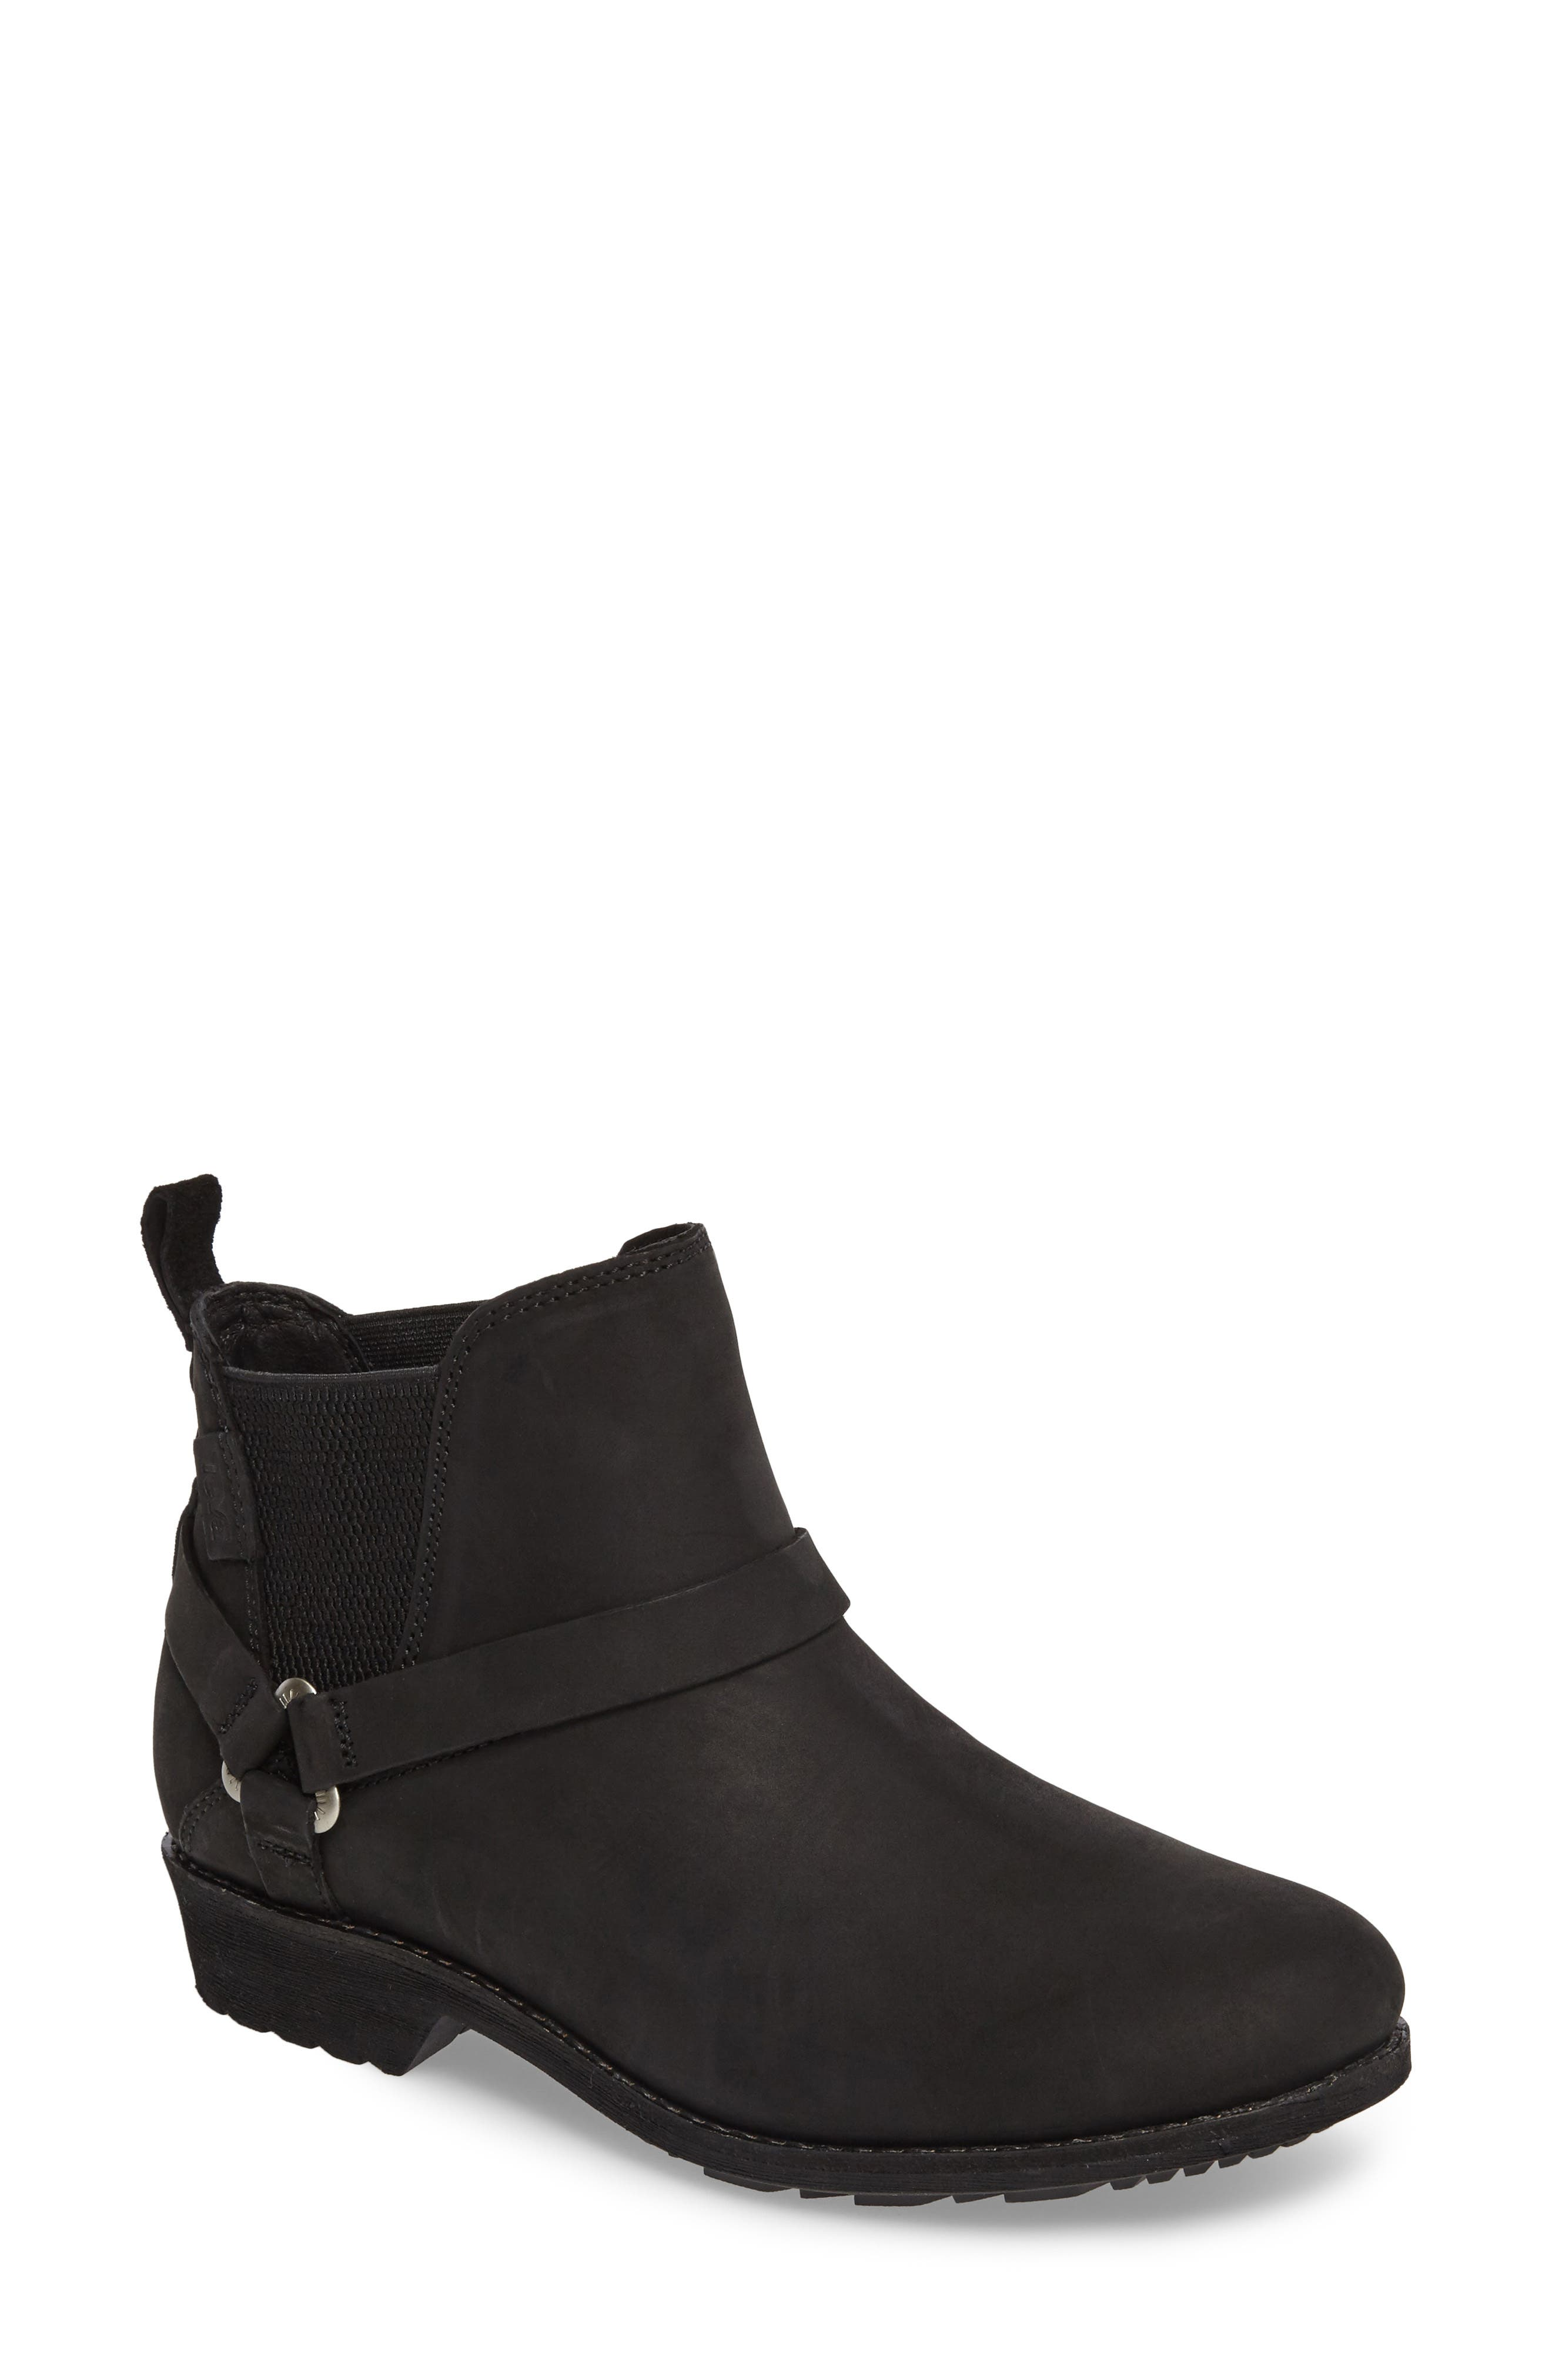 TEVA De La Vina Dos Waterproof Chelsea Boot, Main, color, BLACK LEATHER